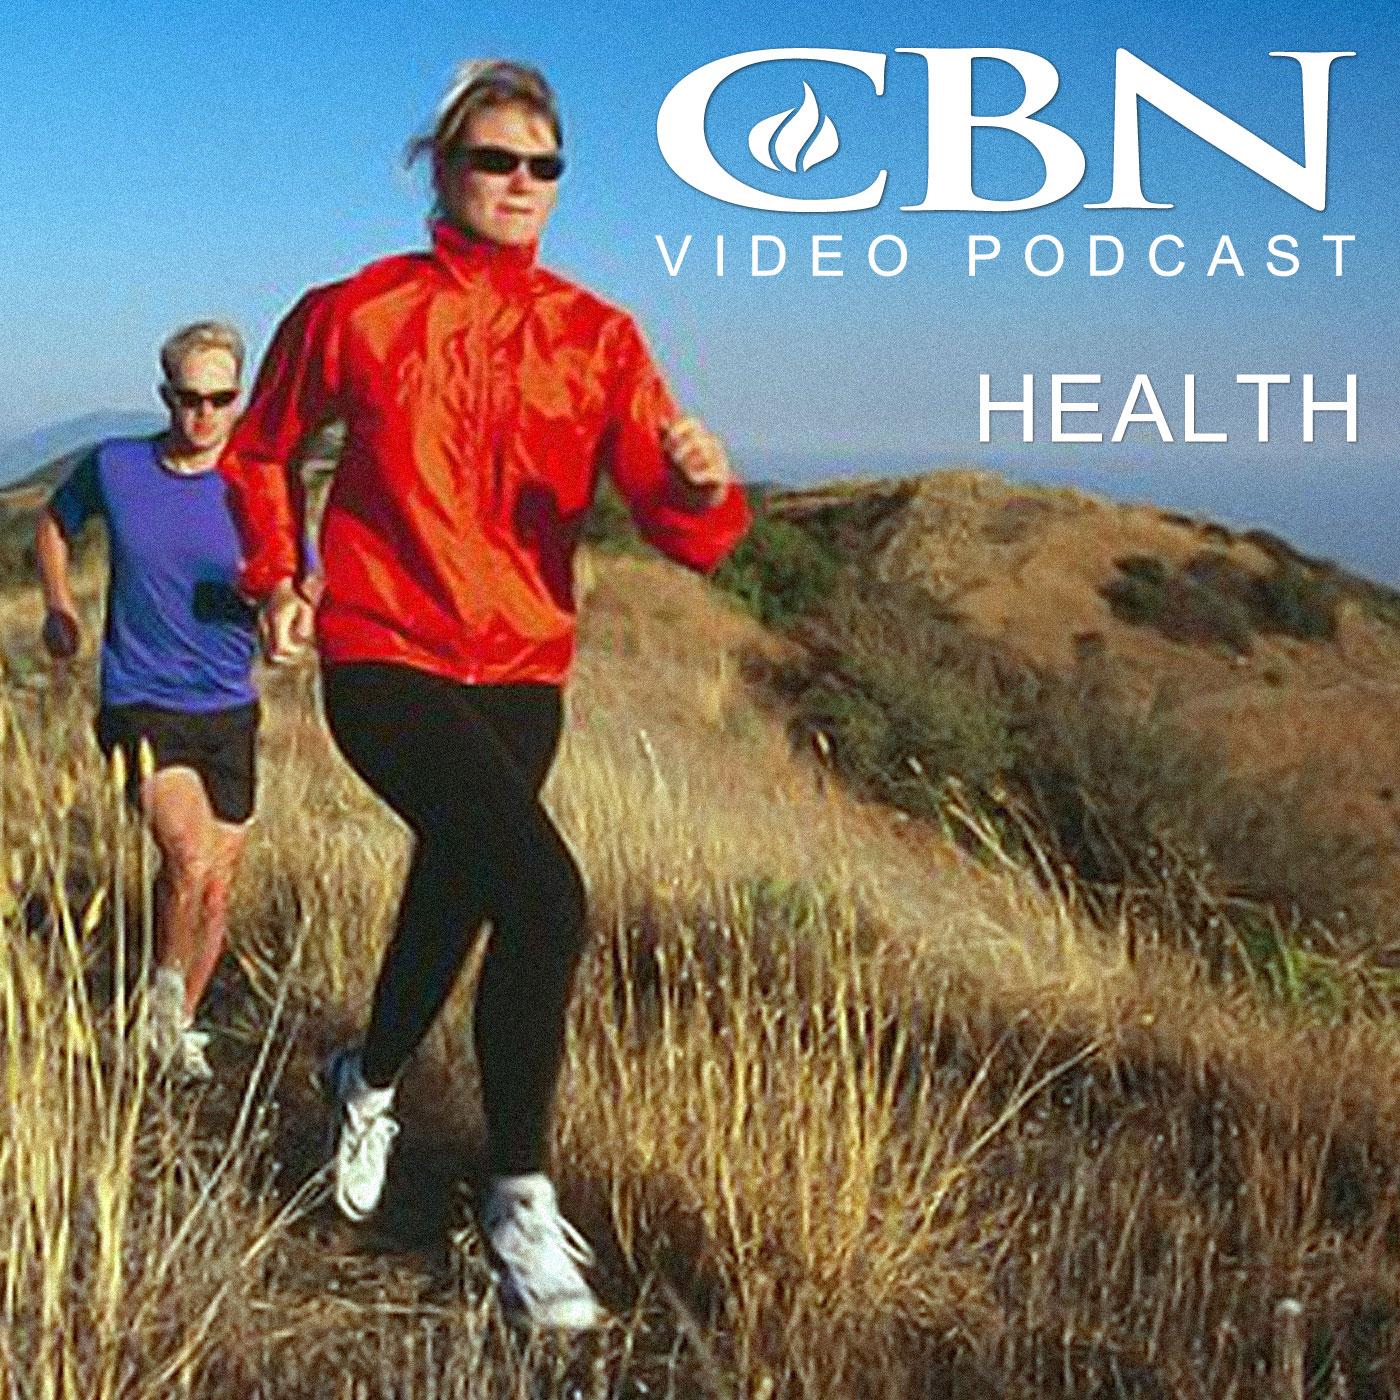 <![CDATA[CBN.com - Health - Video Podcast]]>